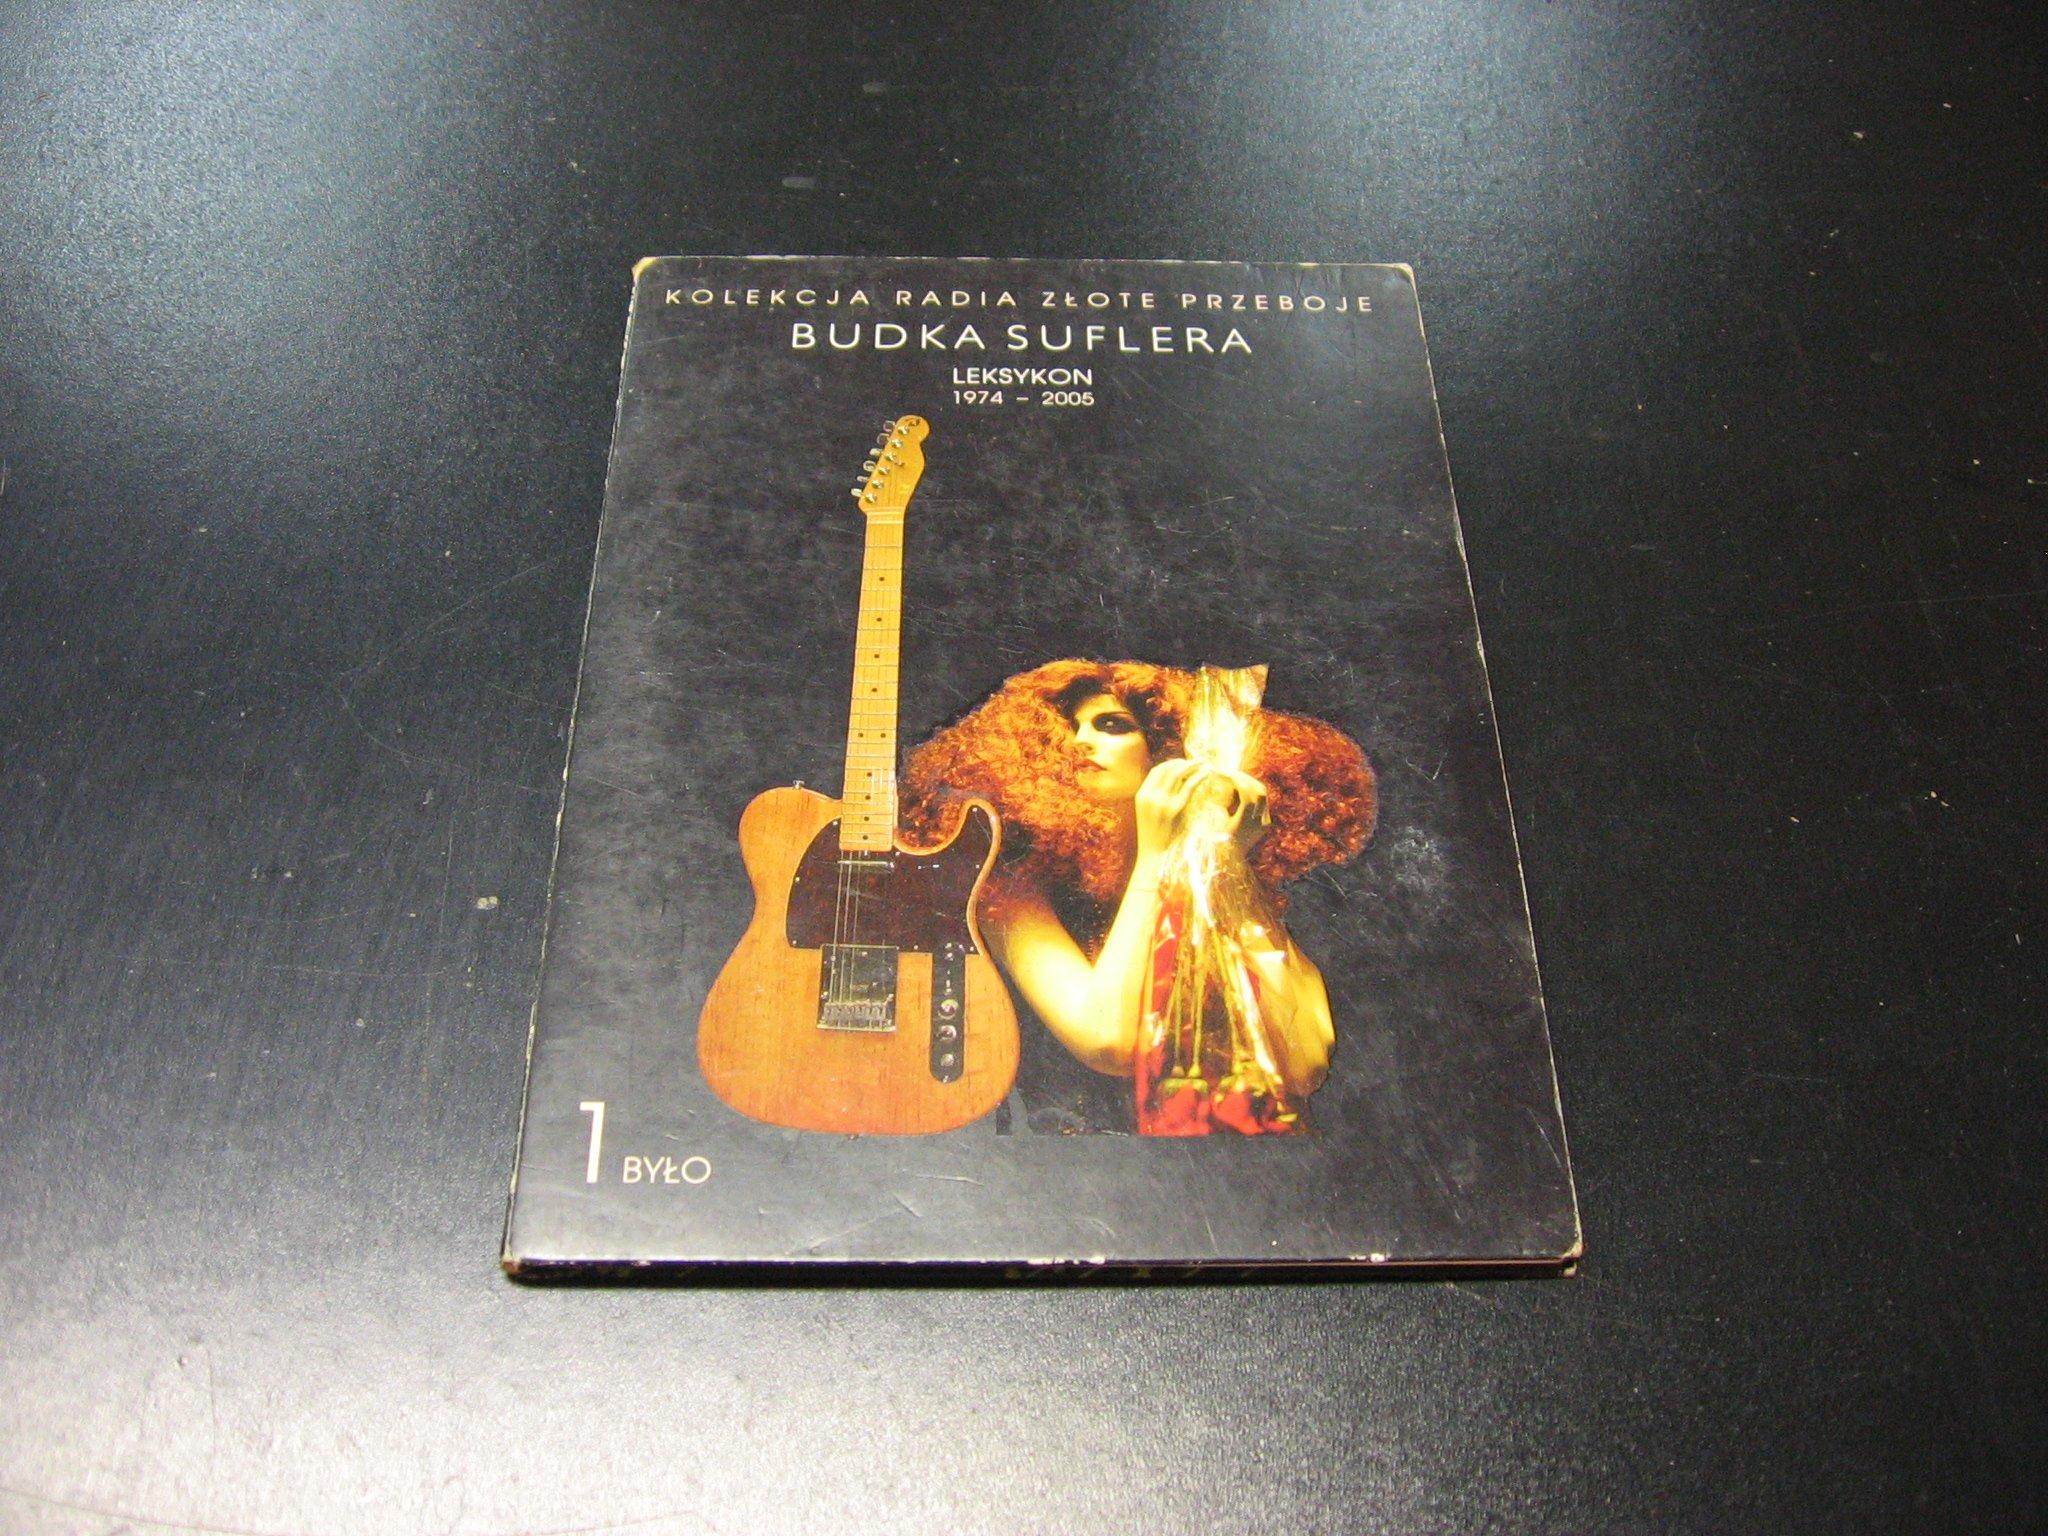 Kolekcja Budka Suflera Leksykon 1974 - 2005 - CD - Sklep